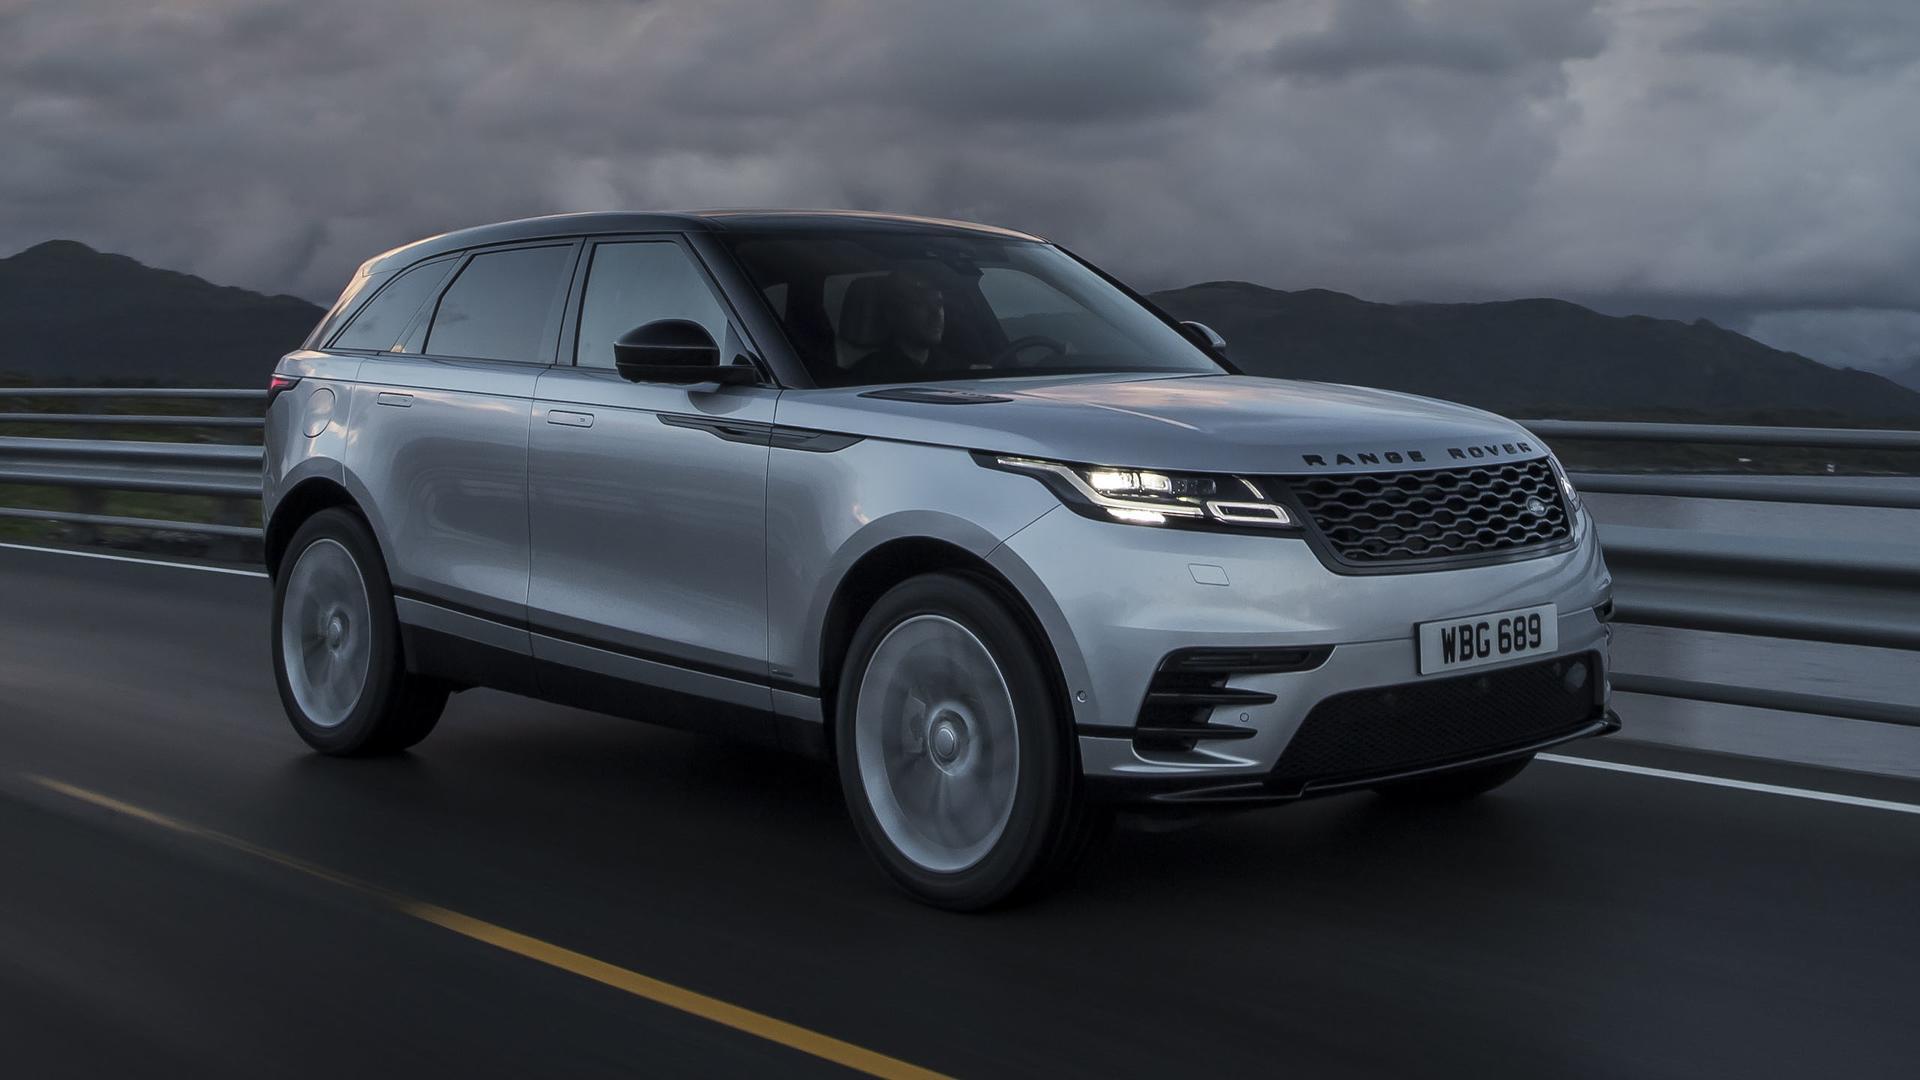 Land Rover Range Rover Velar News and Reviews